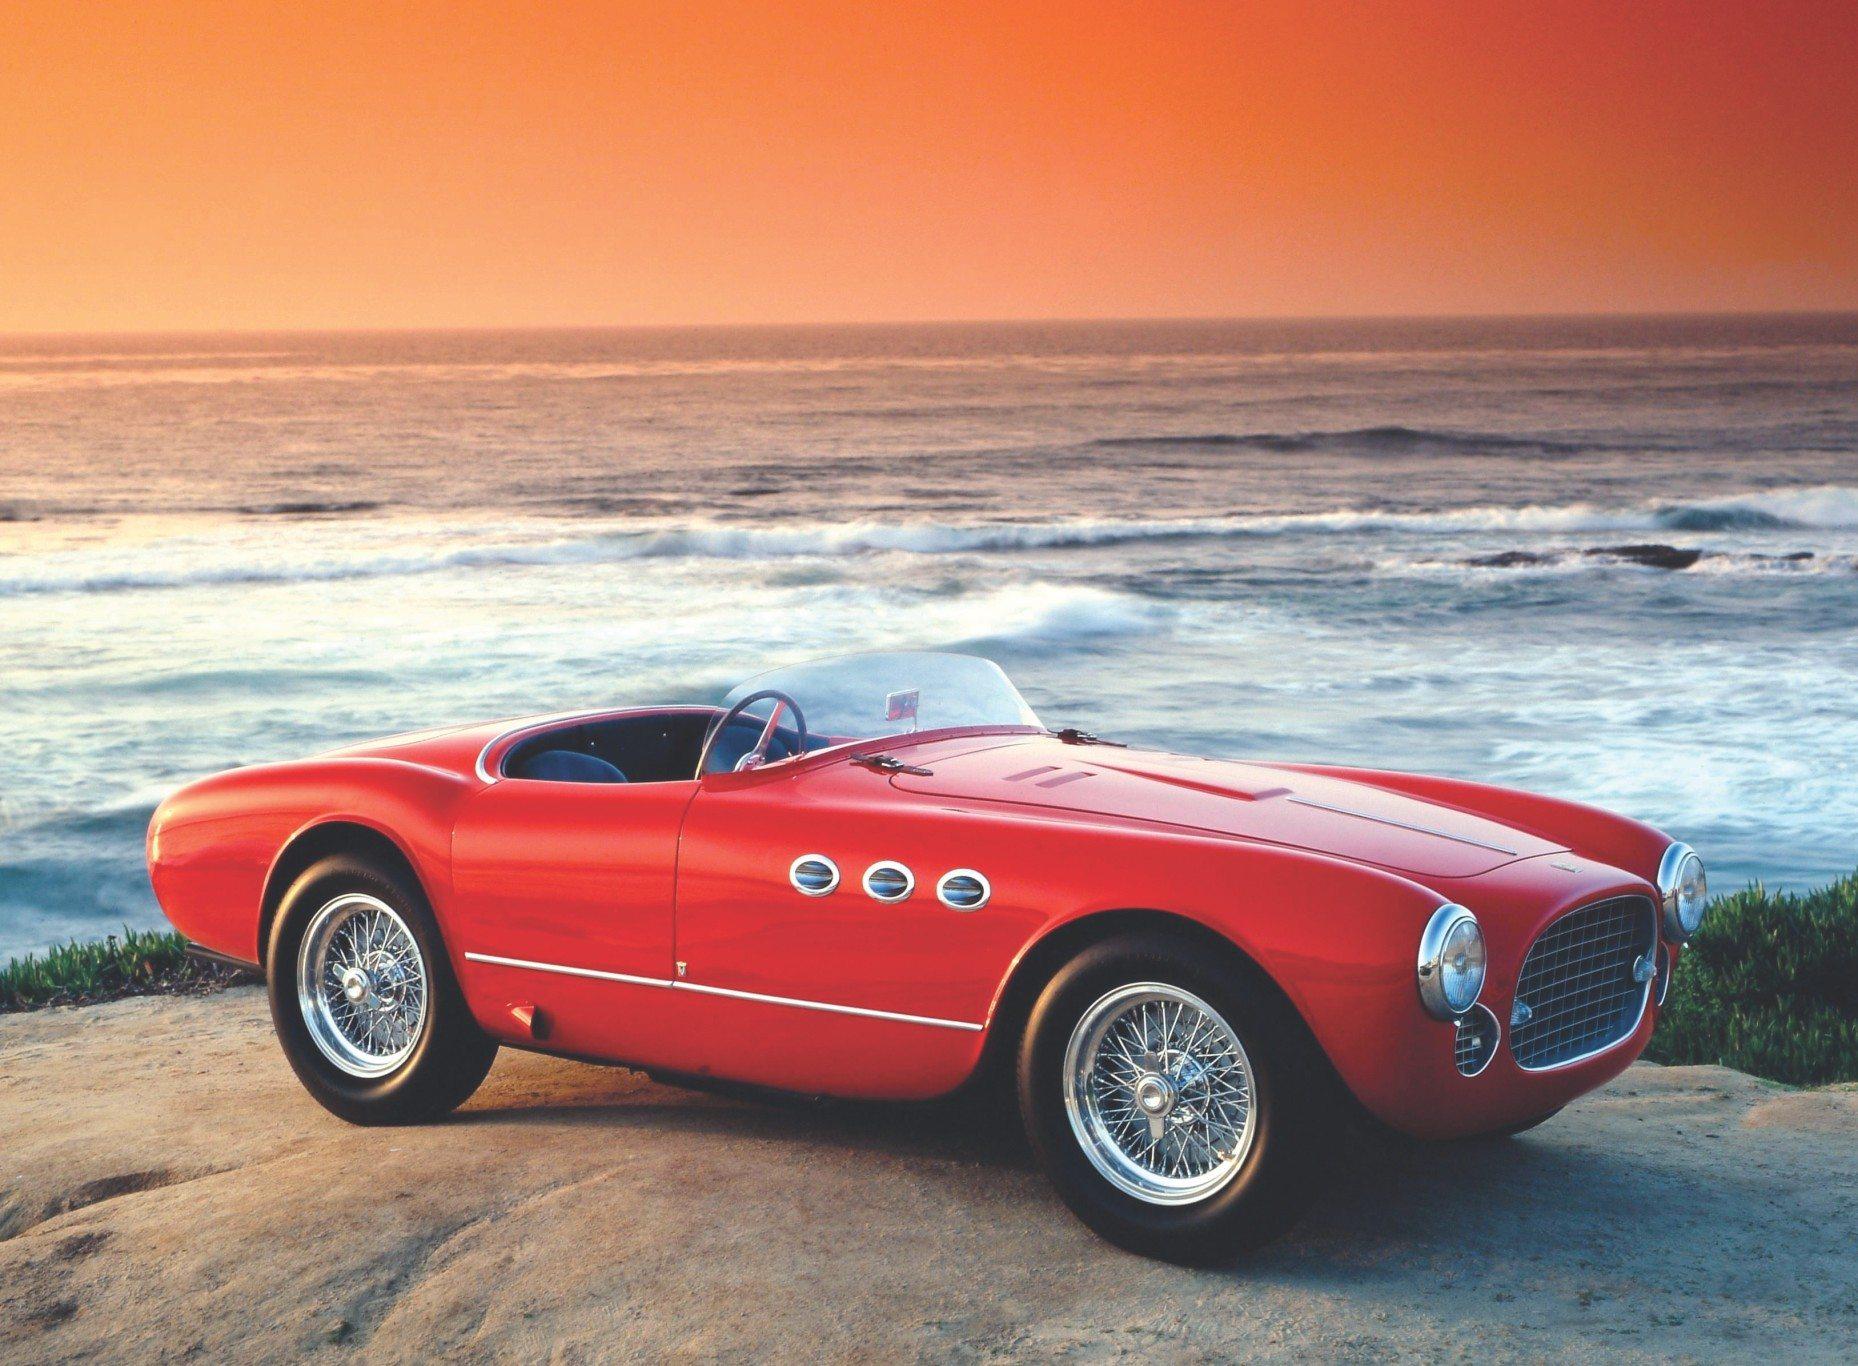 1952 Ferrari 225 S coachwork by Vignale